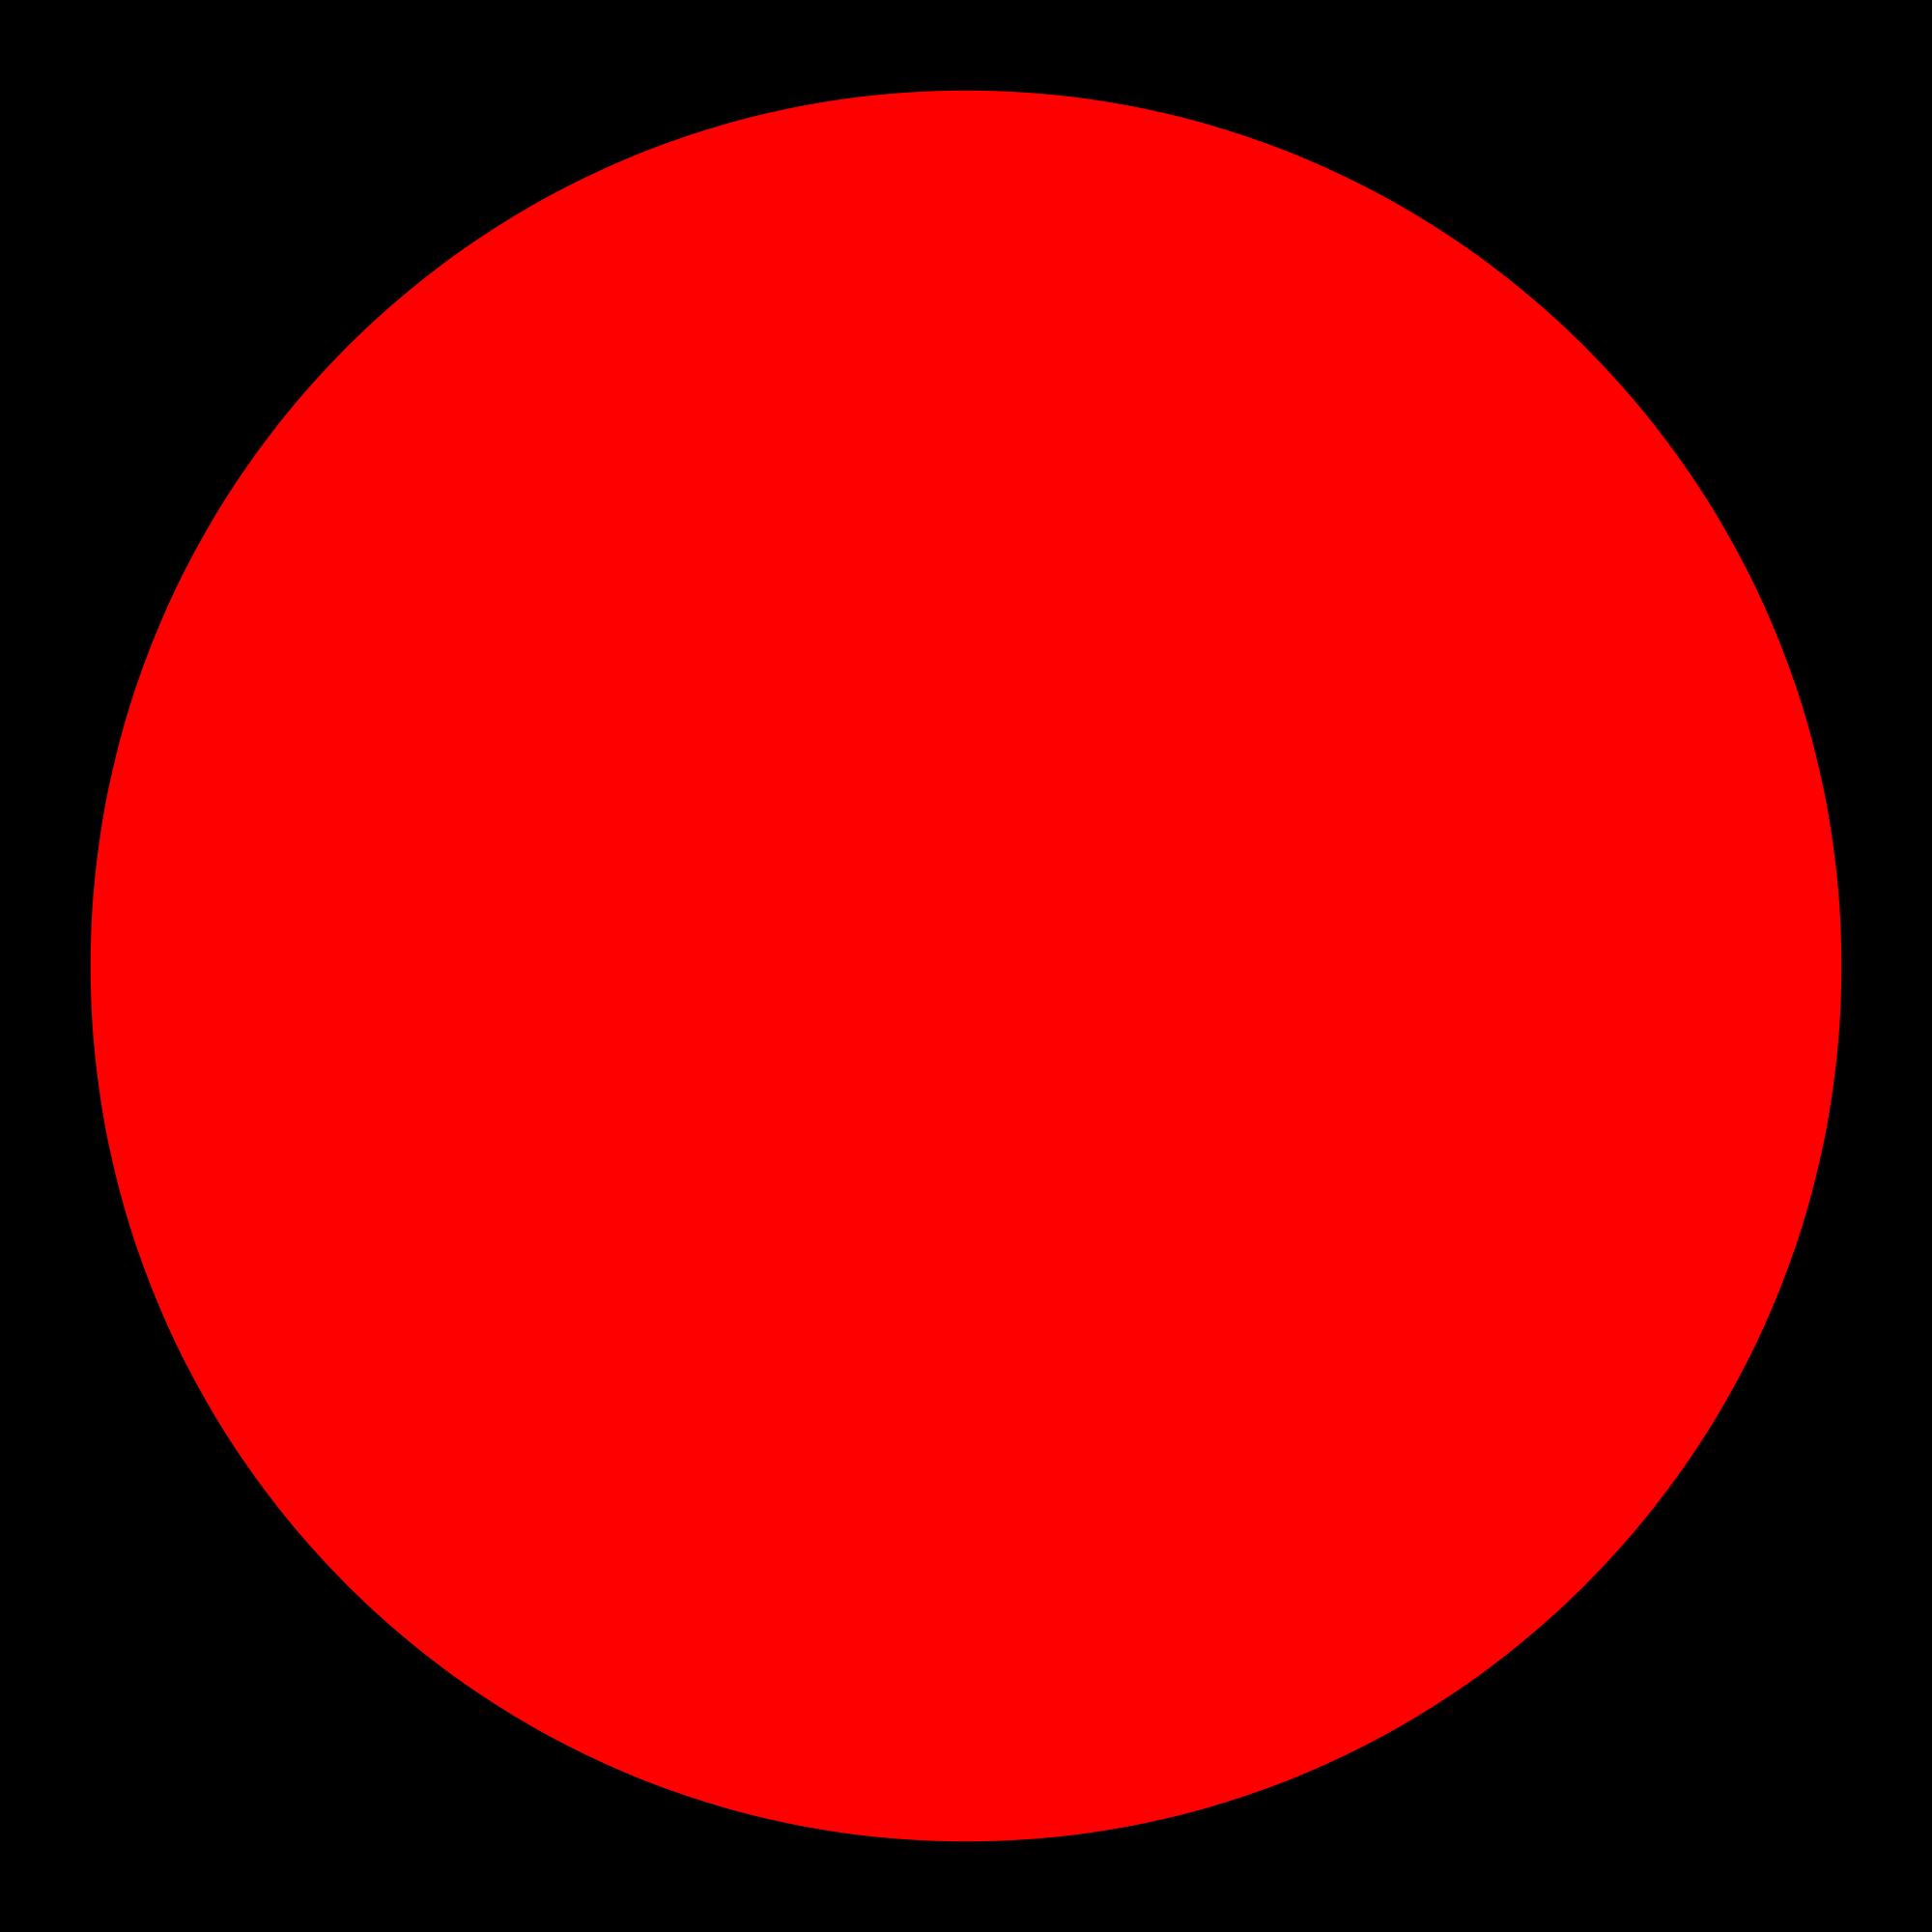 File pictogram ski slope. Notepad clipart red